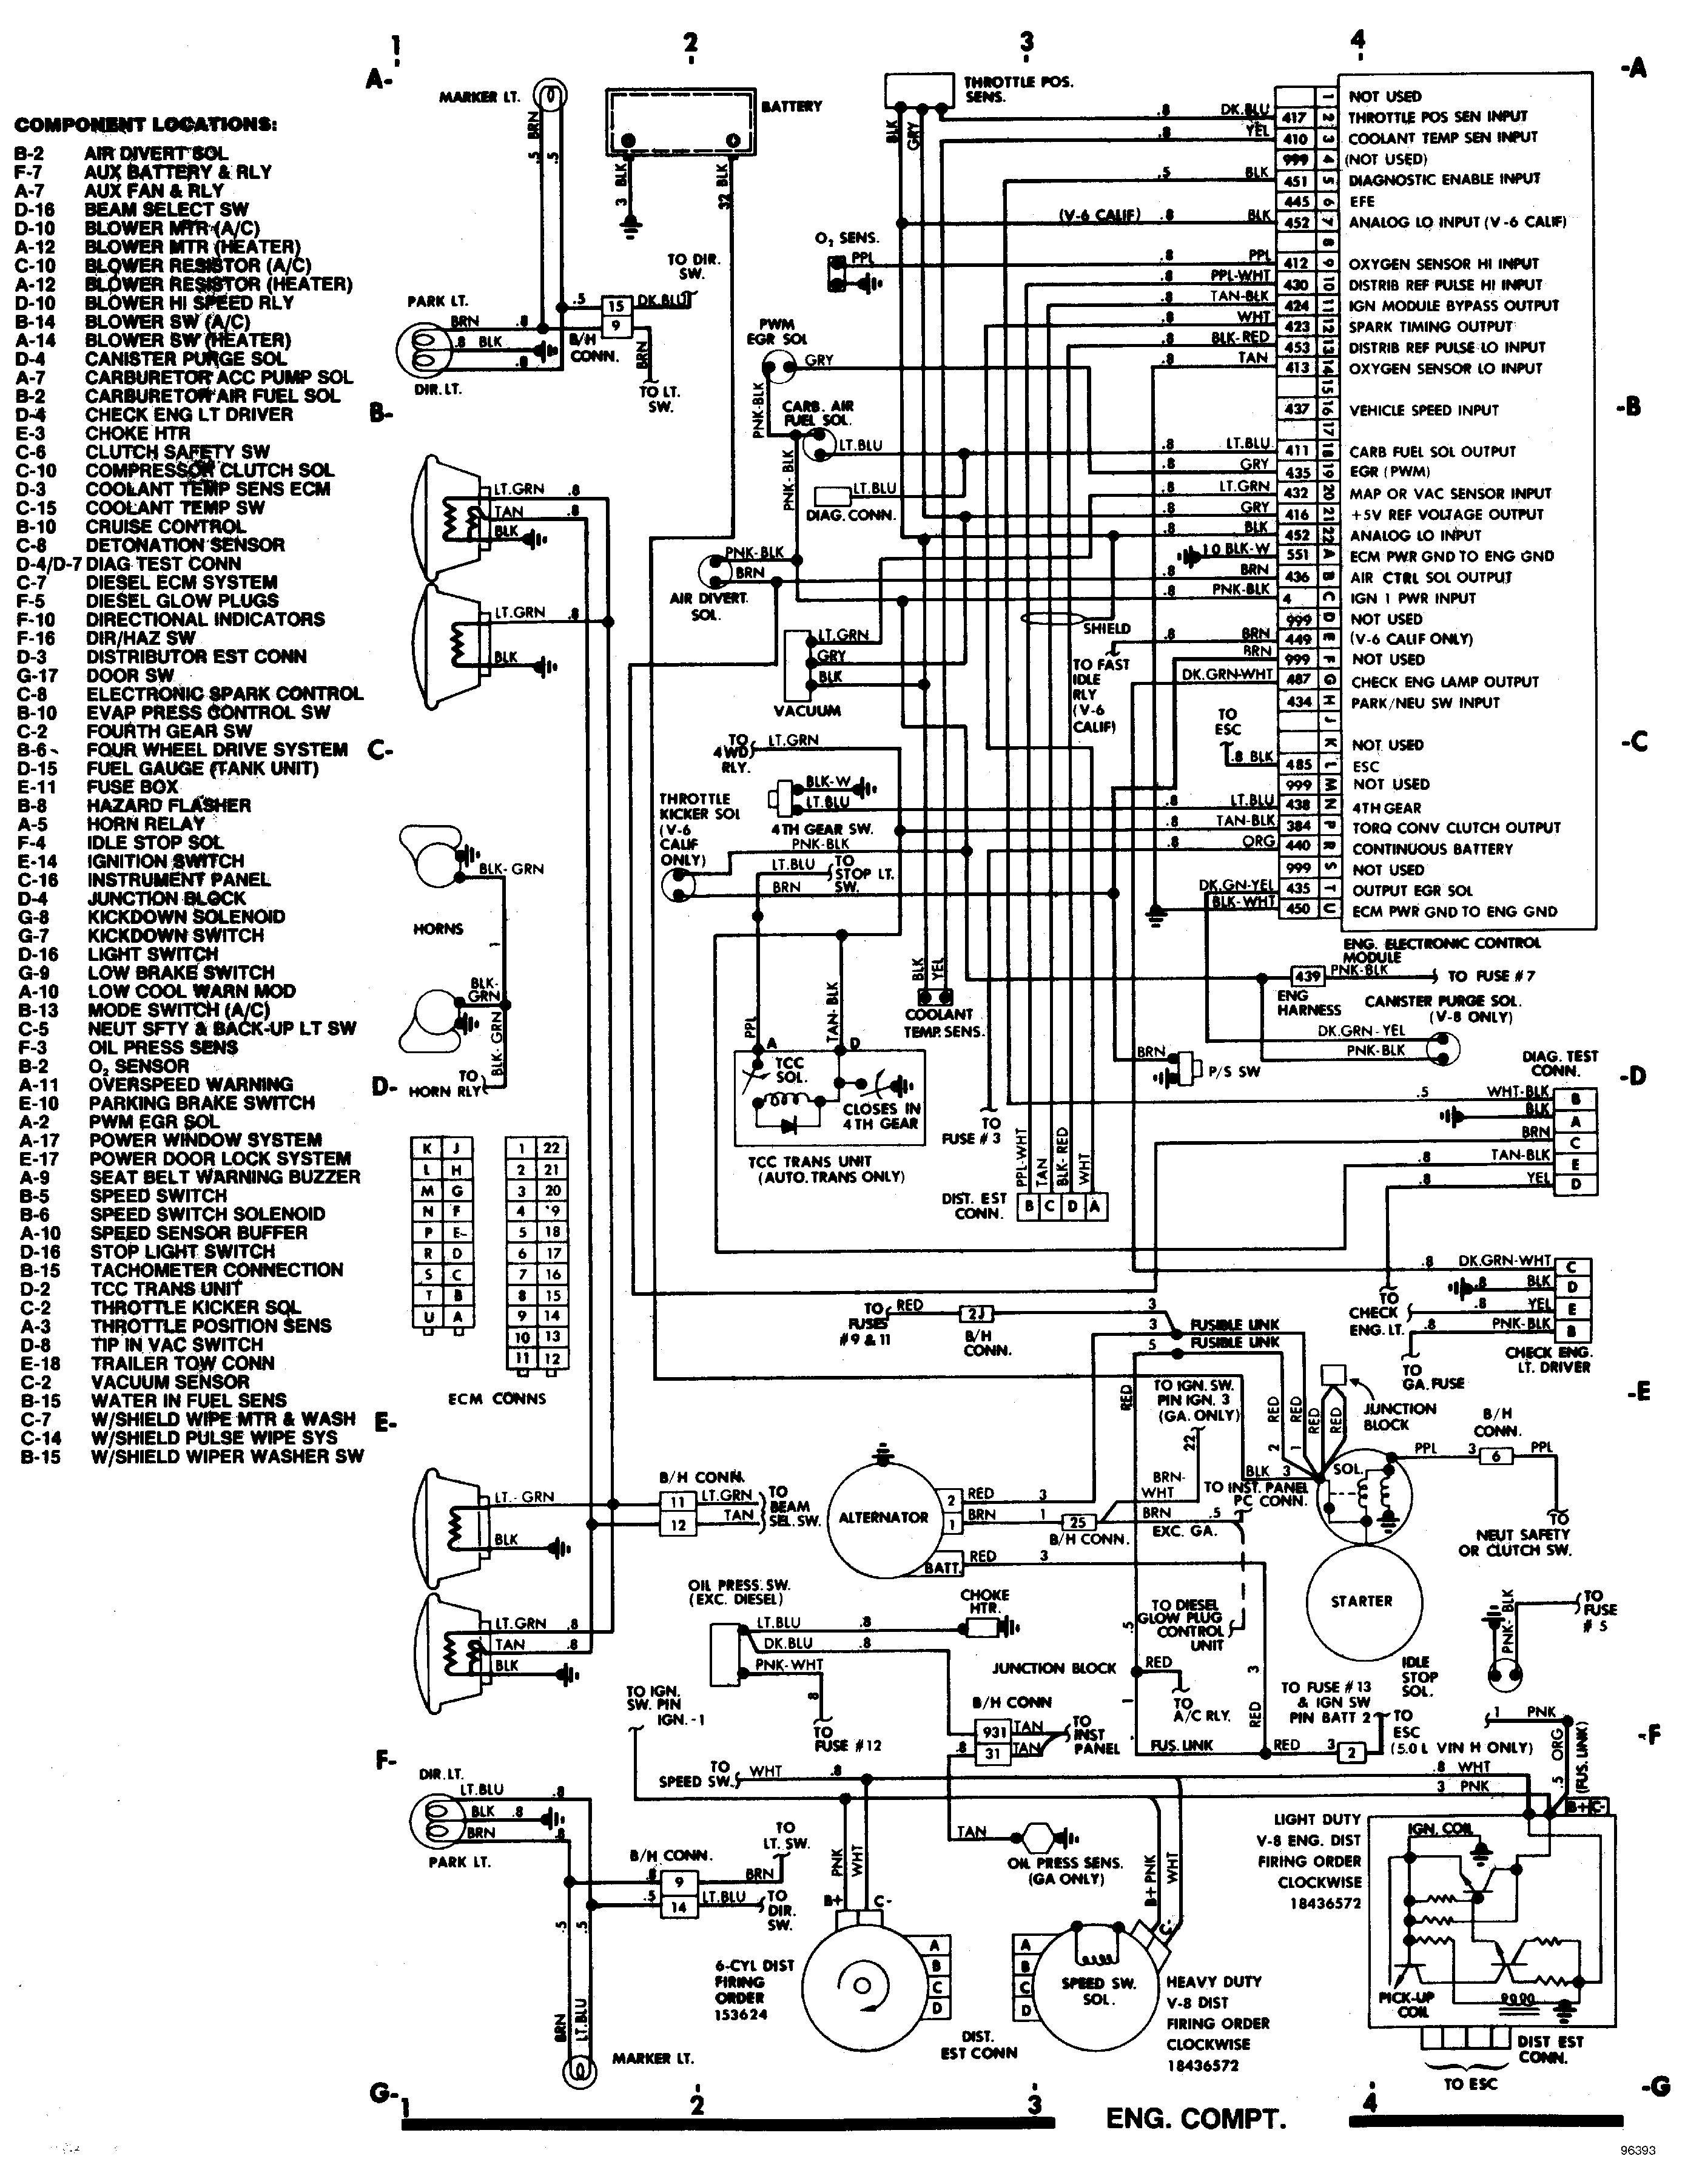 Hero Honda Wiring Diagram Bookingritzcarlton Info Electrical Wiring Diagram Chevy Trucks Electrical Diagram